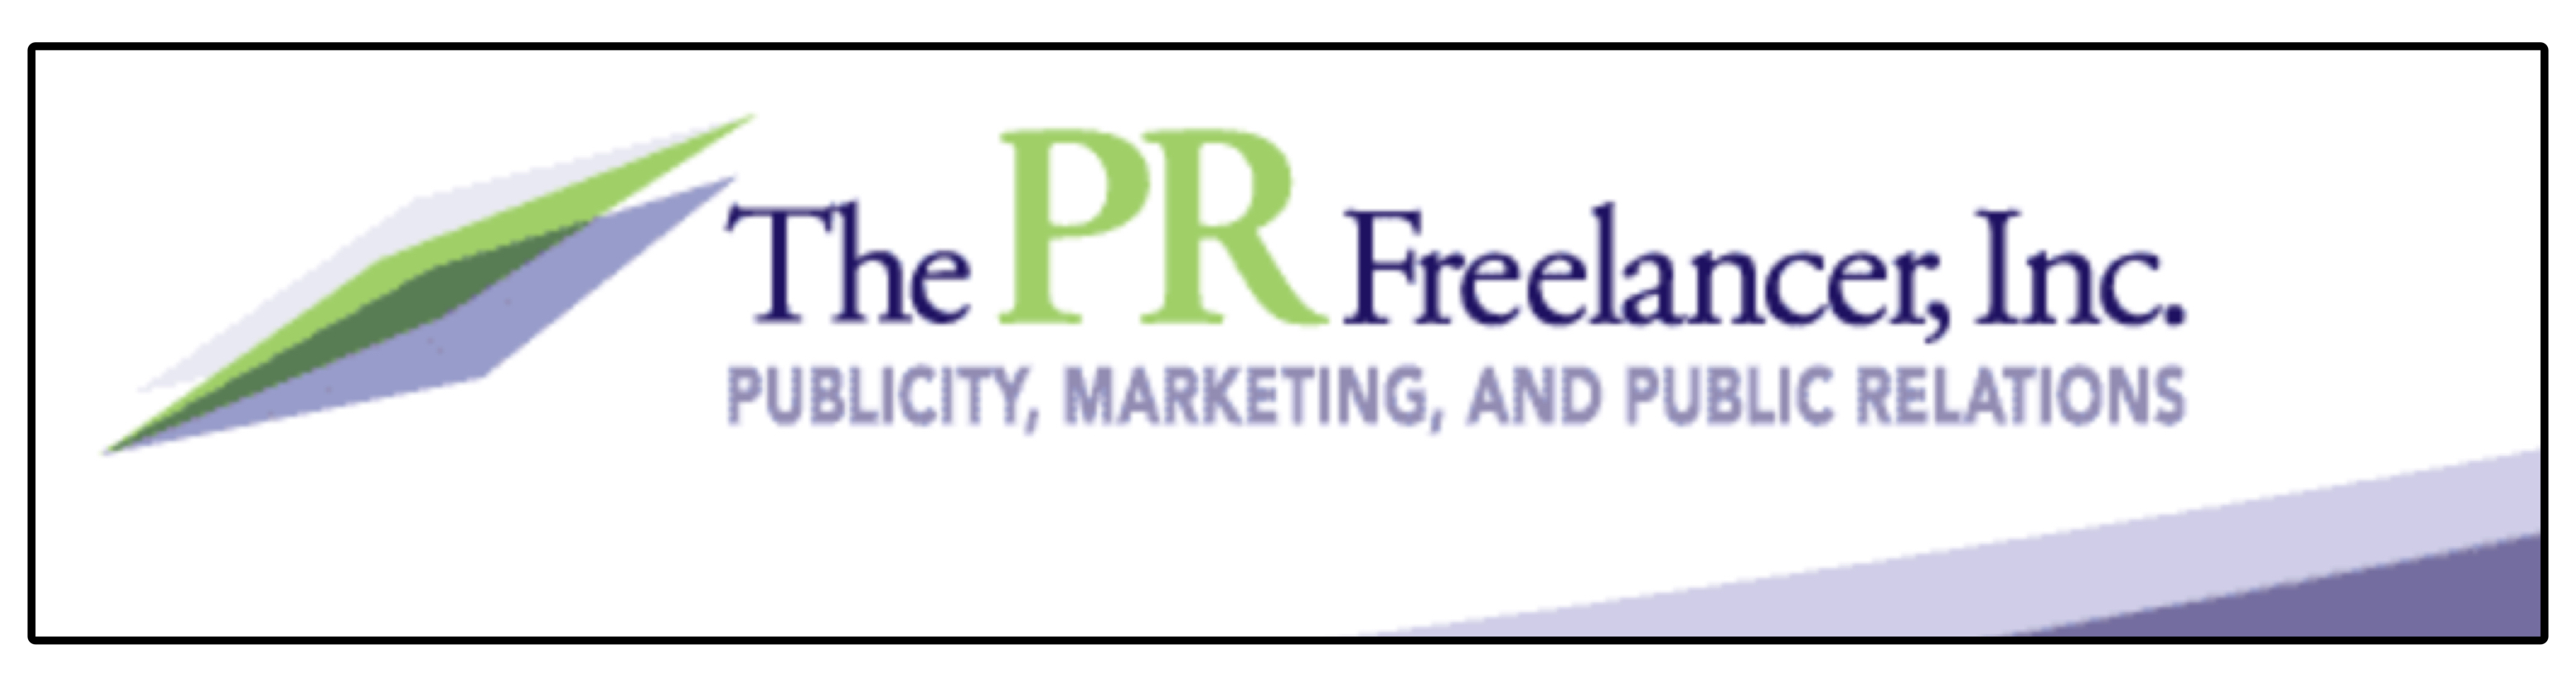 The PR Freelancer, Inc.